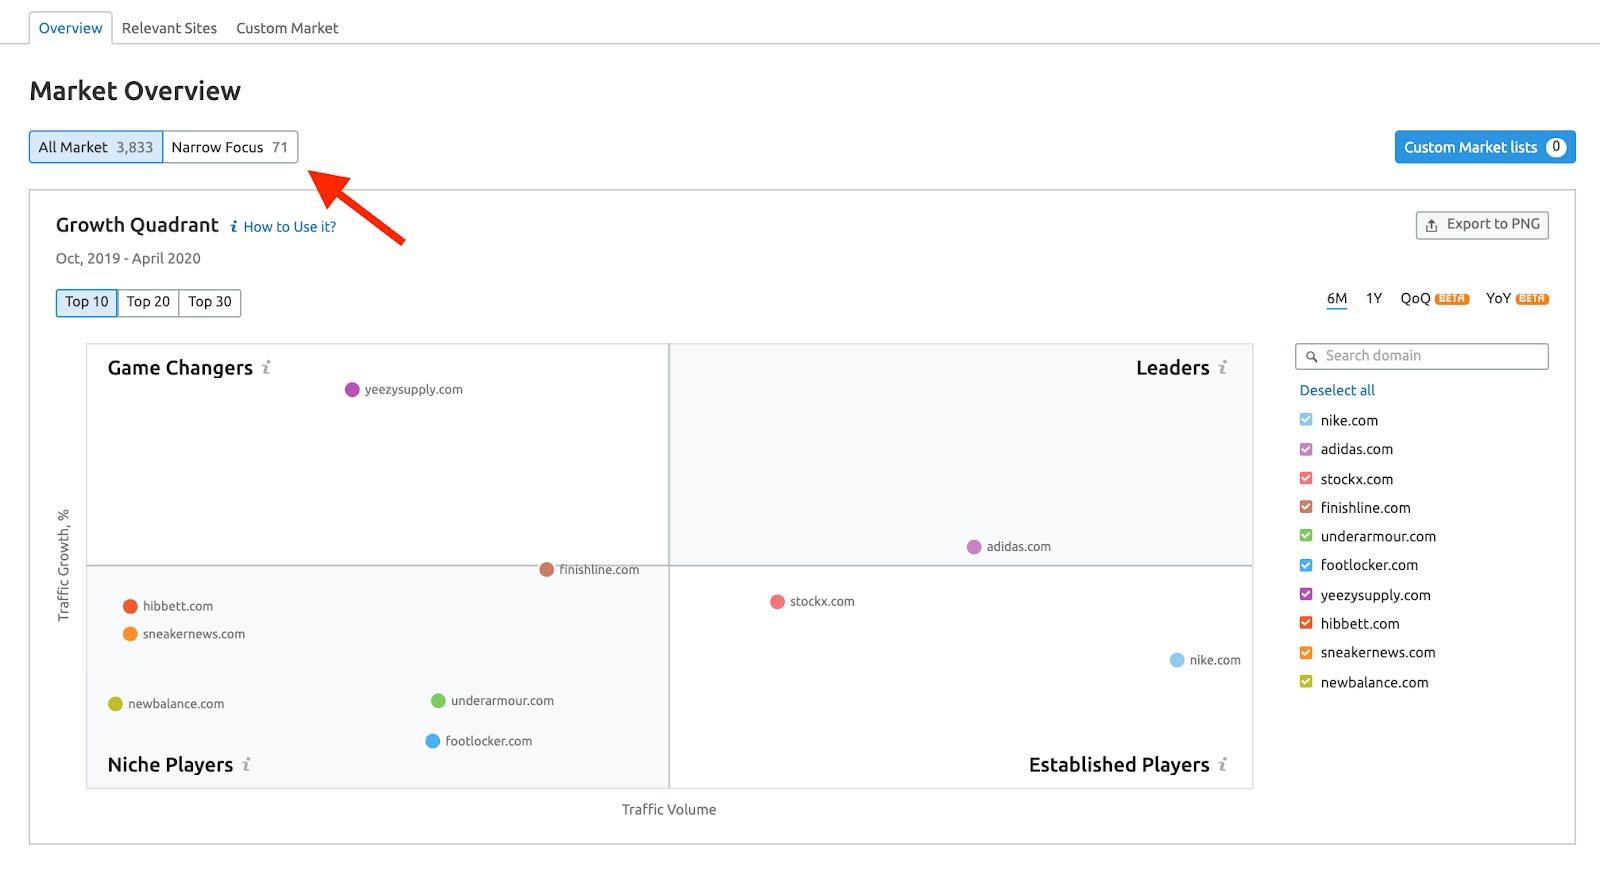 Market Explorer Overview Report image 1